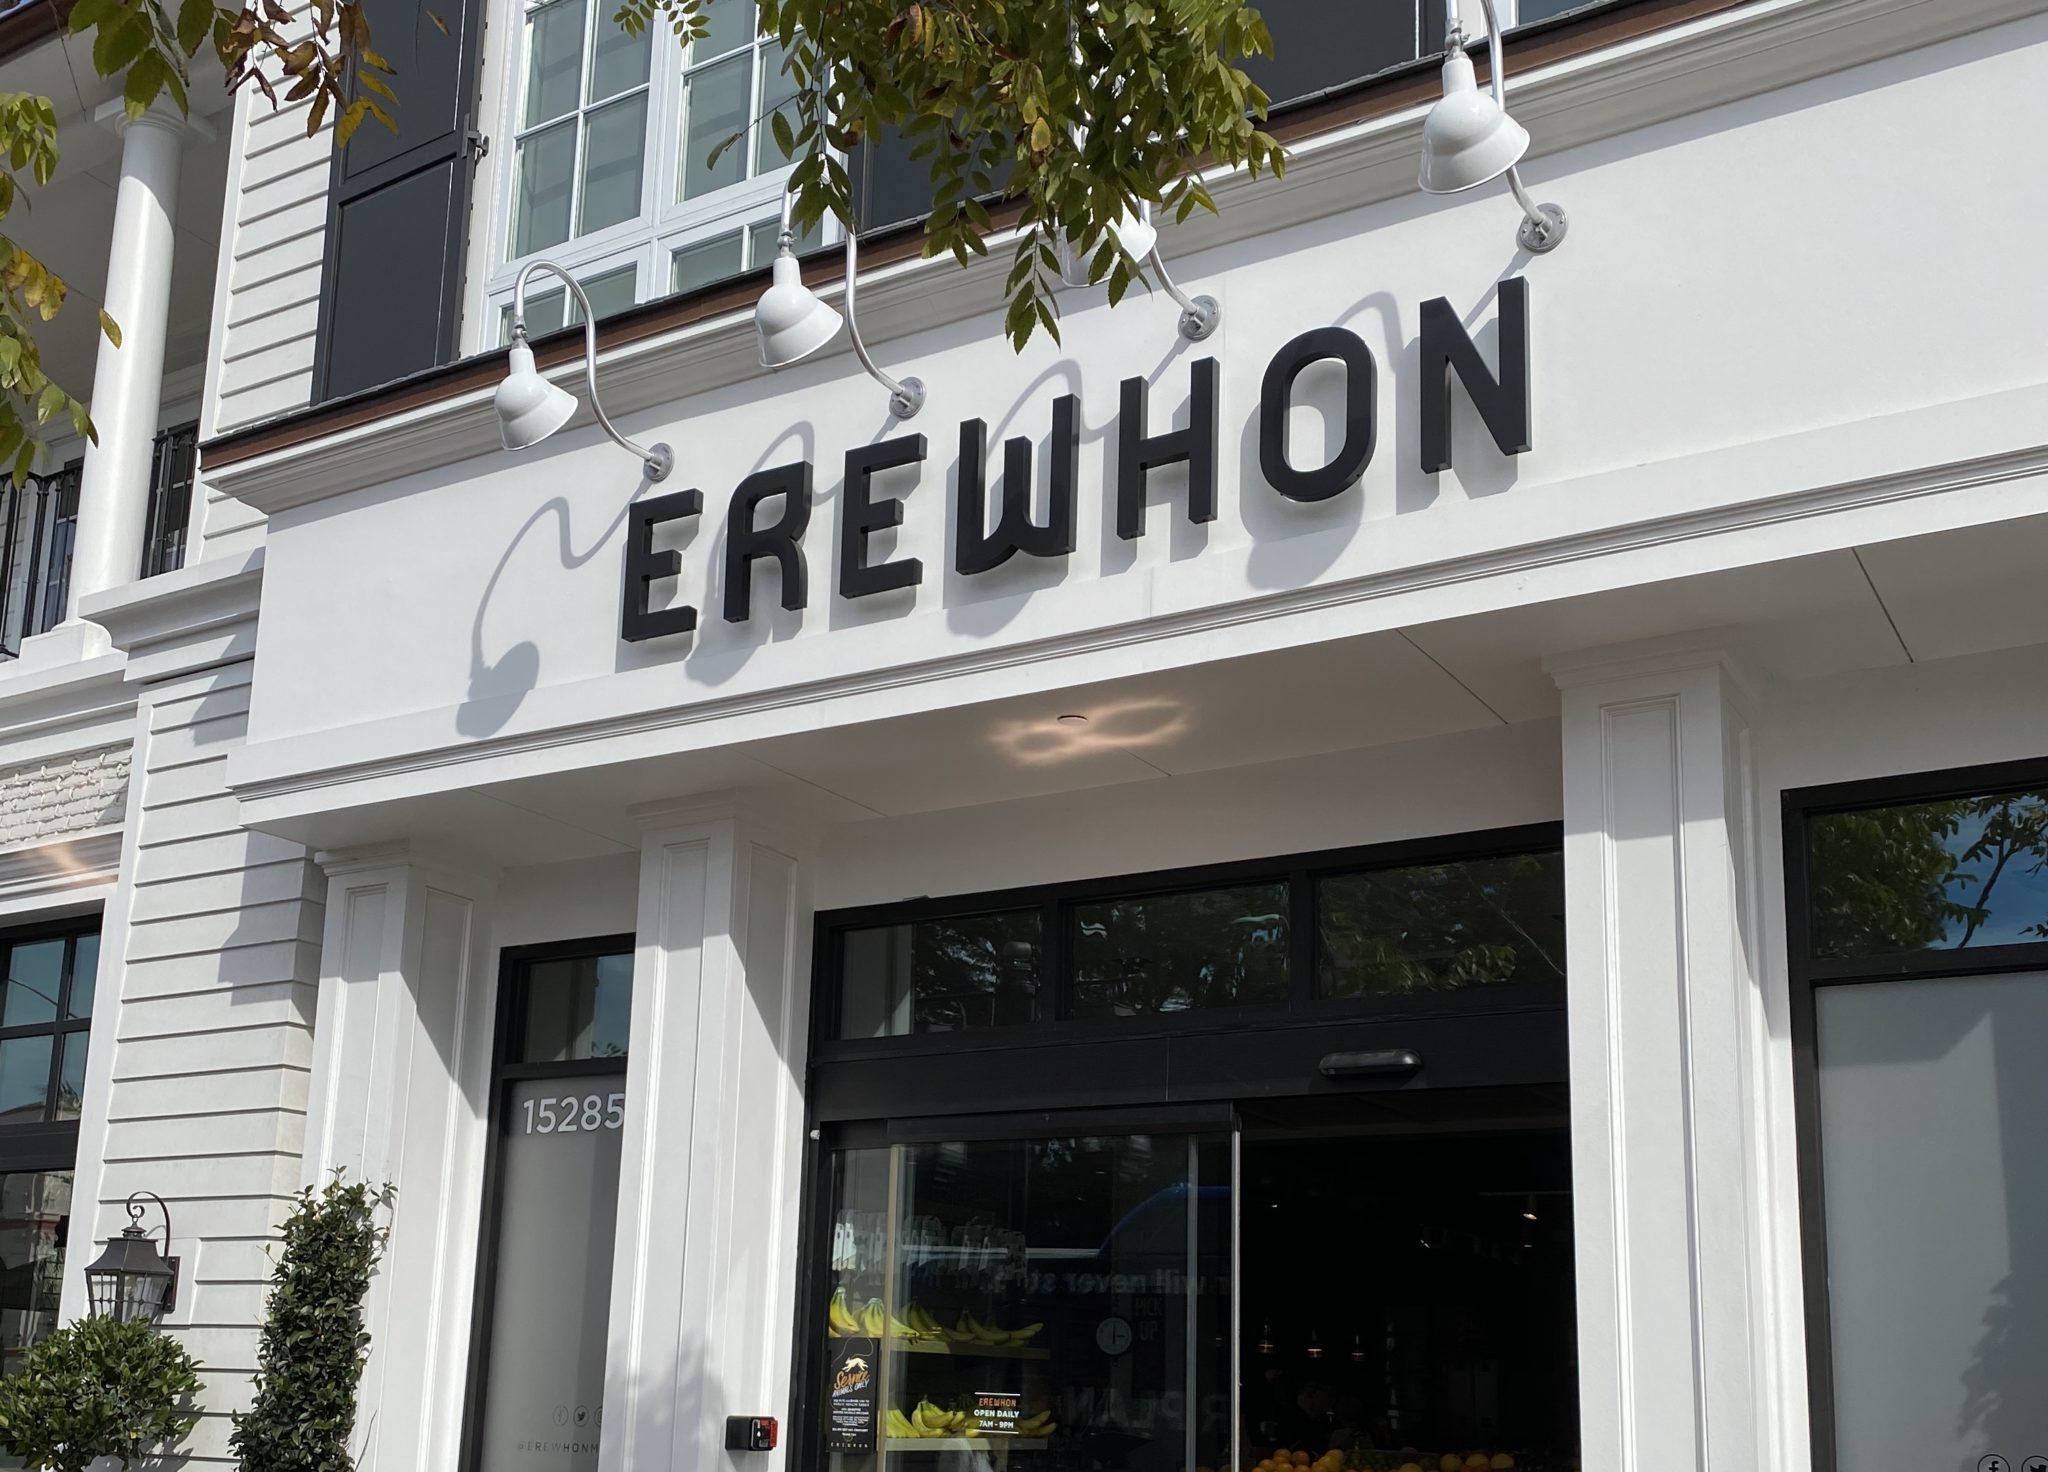 Erewhon Storefront